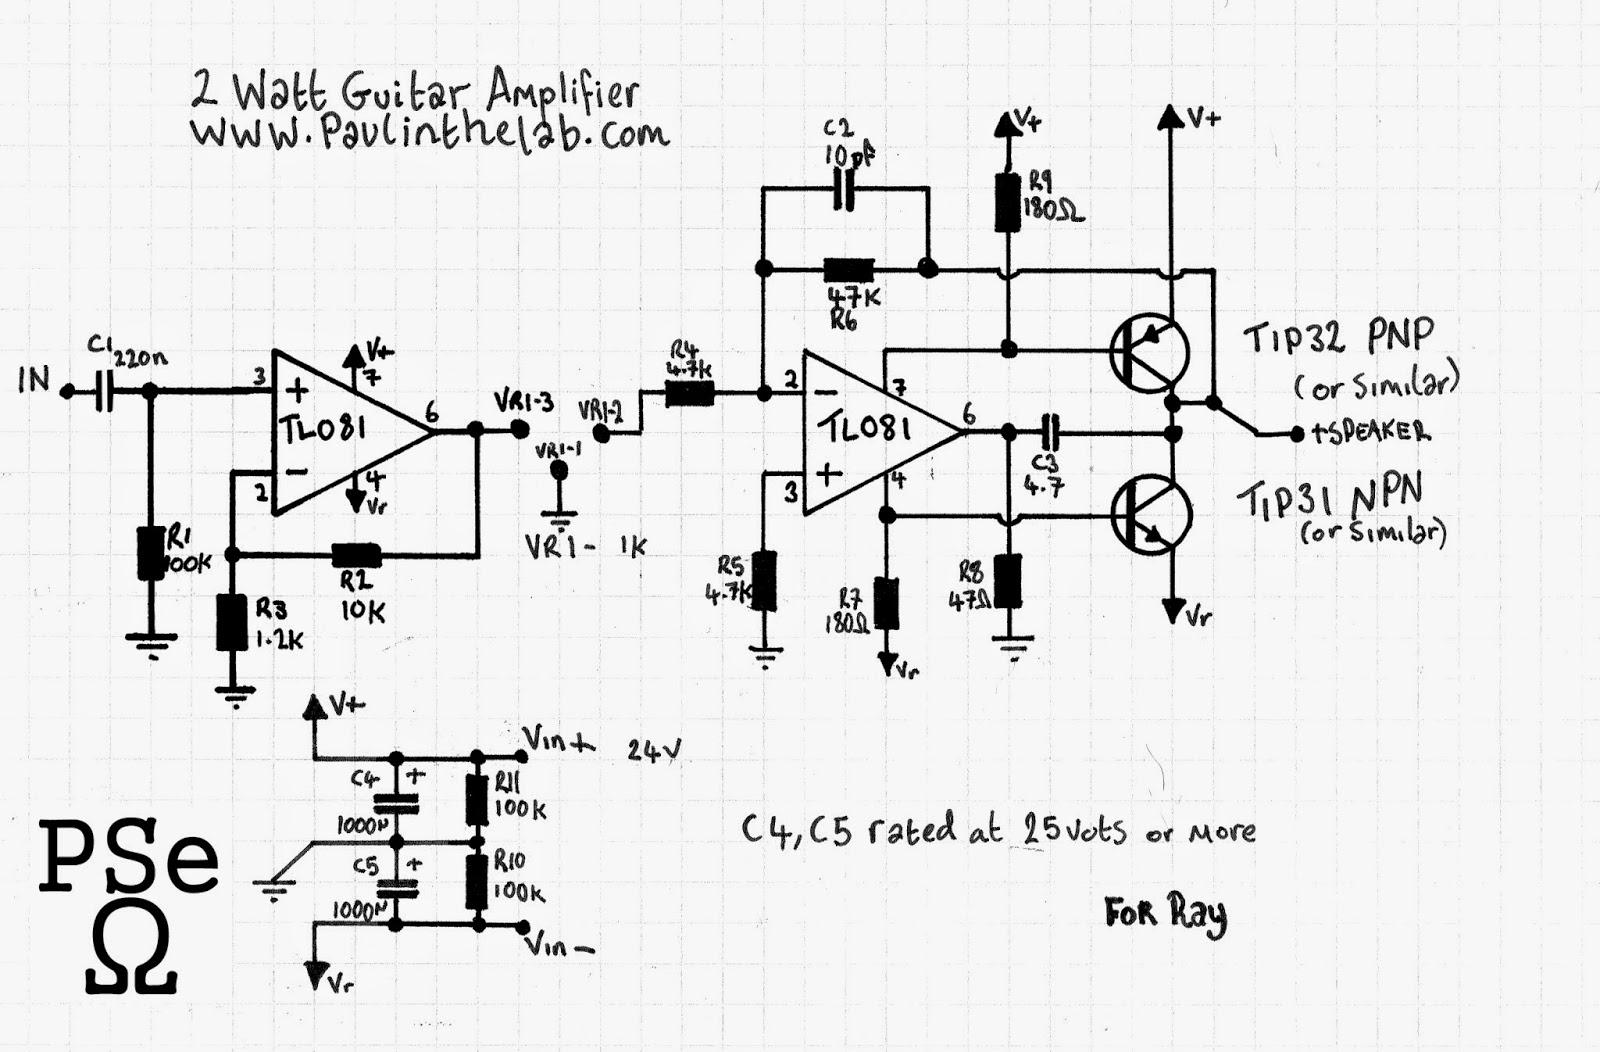 Paul In The Lab 2 Watt Transistor Guitar Amplifier Stripboard Simple 3 Sunday 12 April 2015